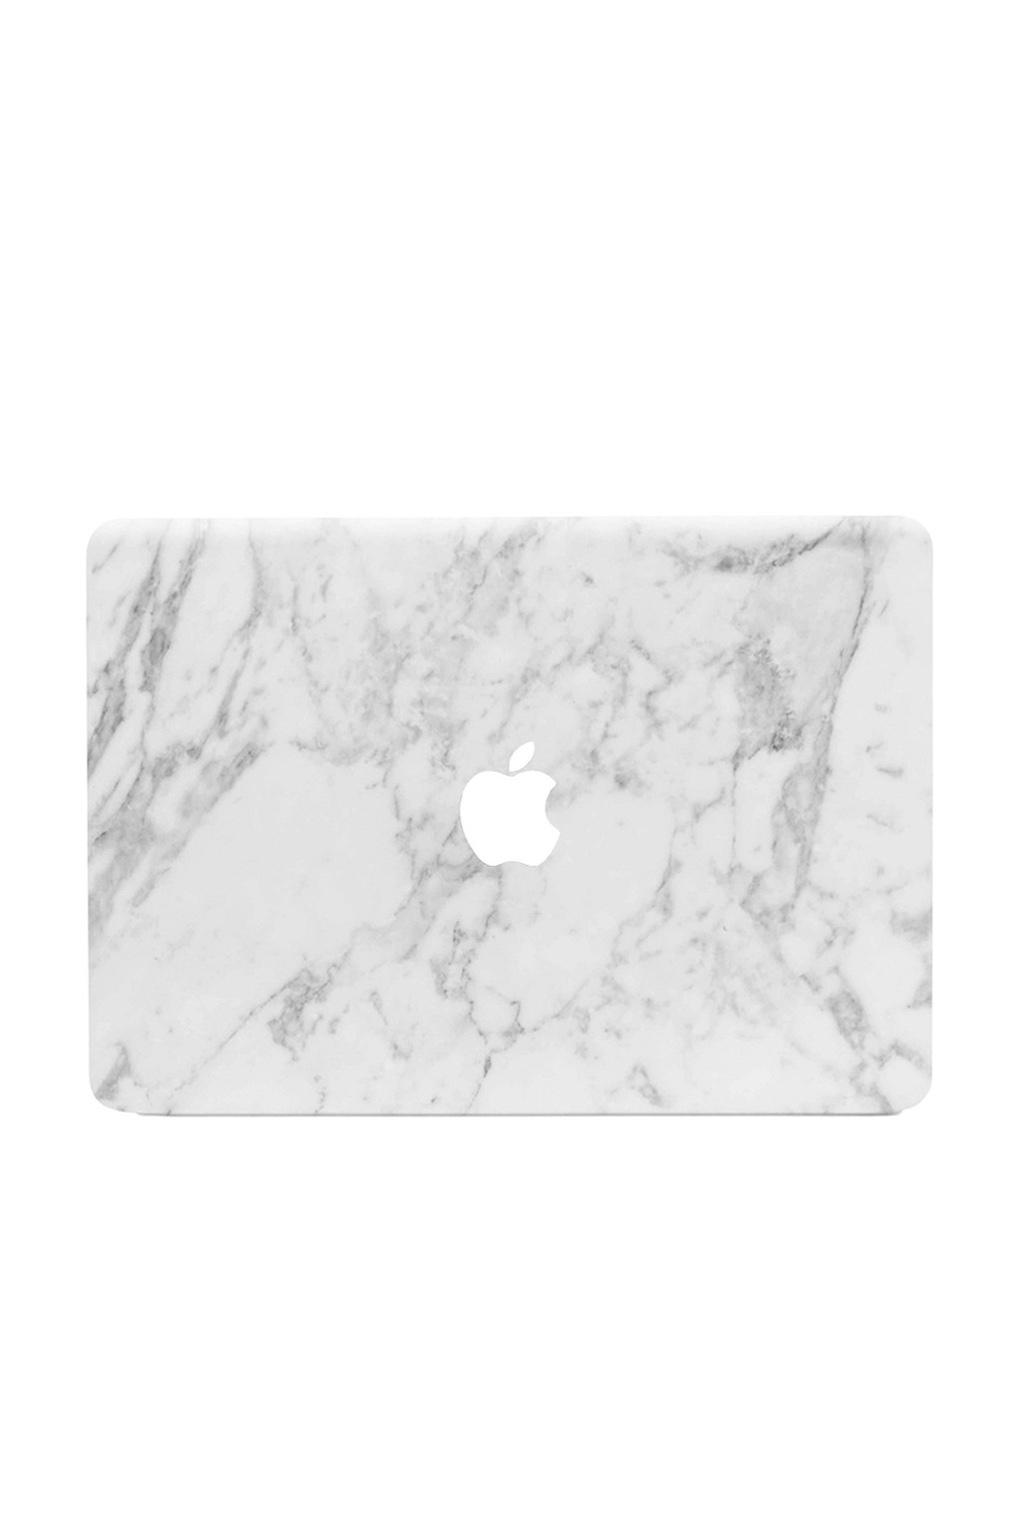 (Preorder) Macbook Marble Decal